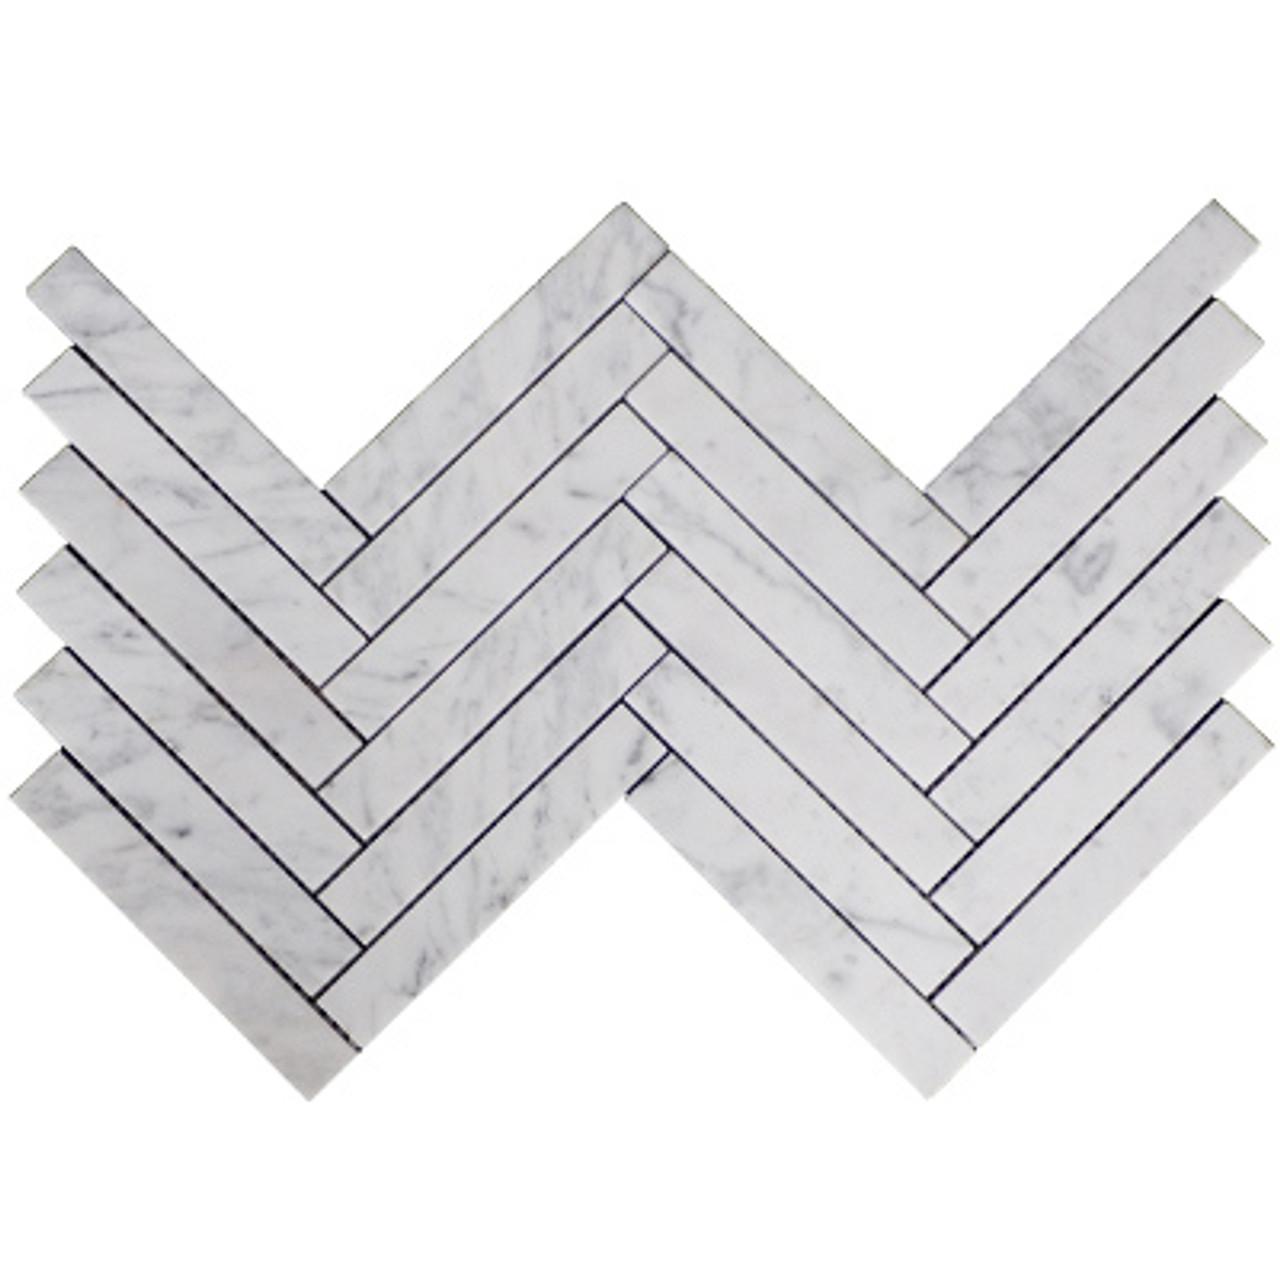 1 X 6 Carrara White Herringbone Mosaic Tile Honed